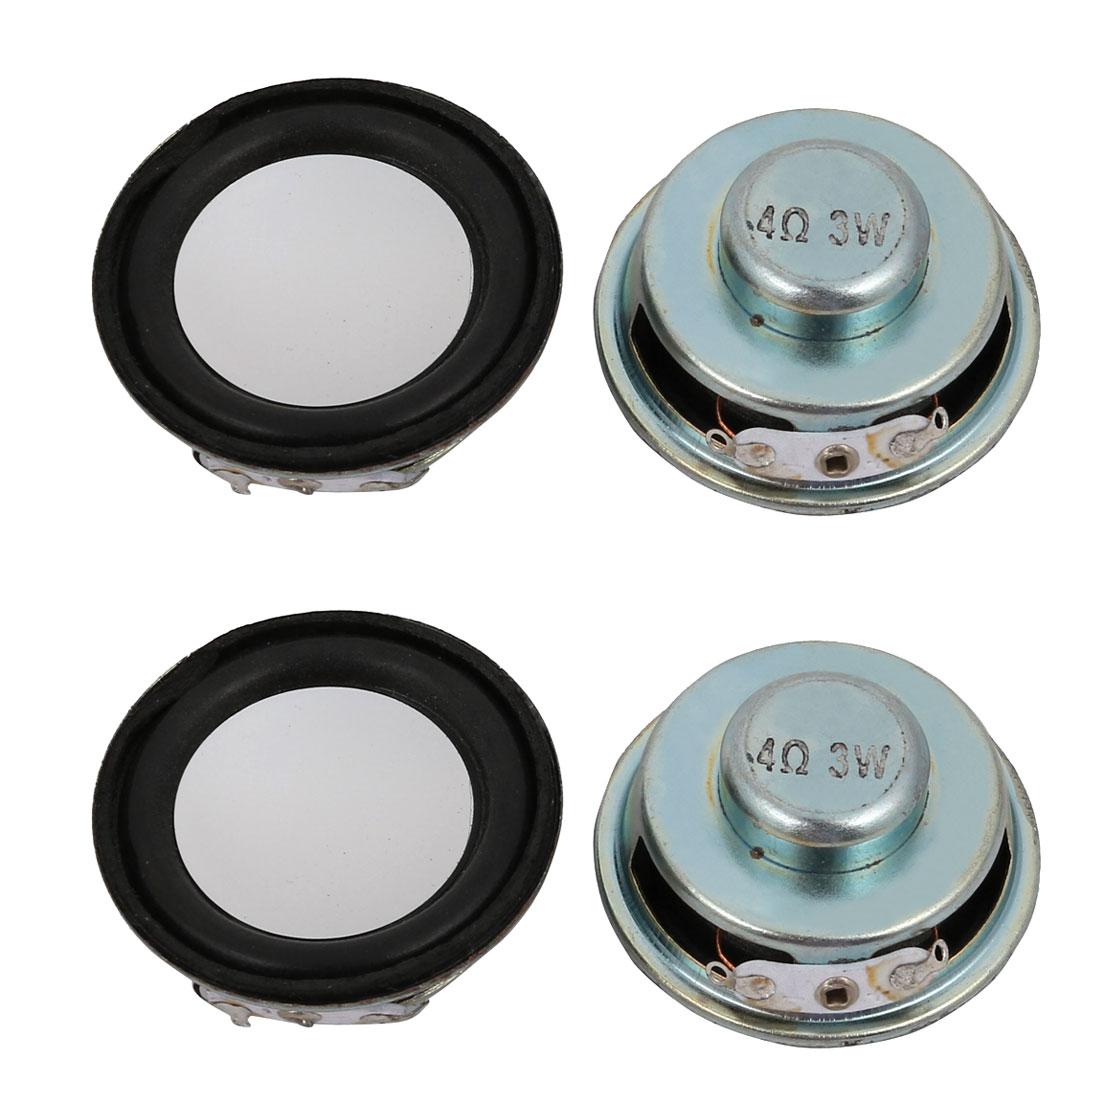 4Pcs 40mm Dia 4 Ohm 3W Metal Shell Internal Mini Speakers Magnetic Loudspeaker